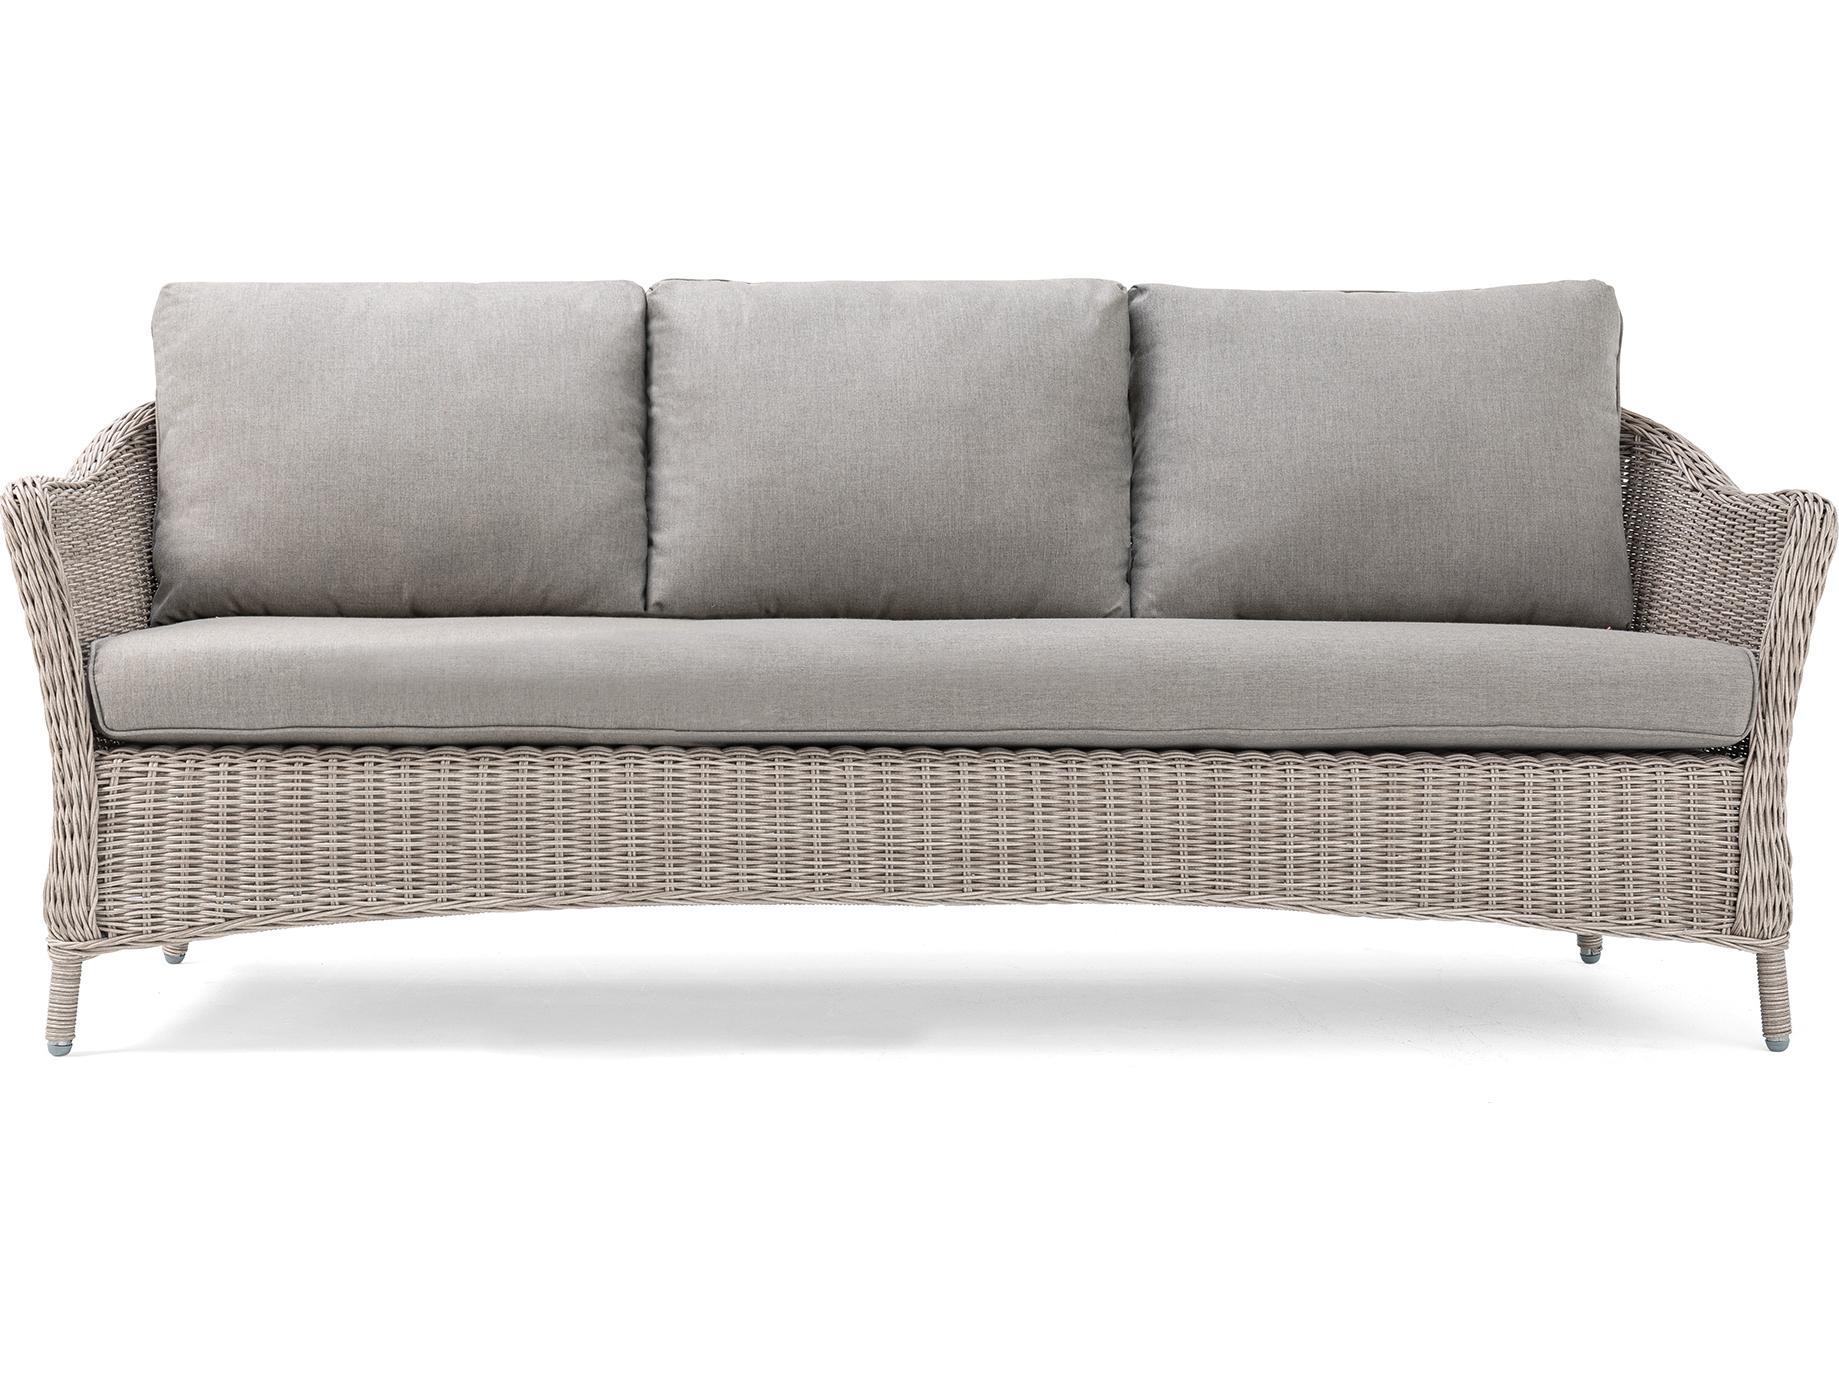 La Z Boy Quick Ship Laurel Cushion Gray Wicker Sofa In Pertaining To Laurel Gray Sofas (View 3 of 15)